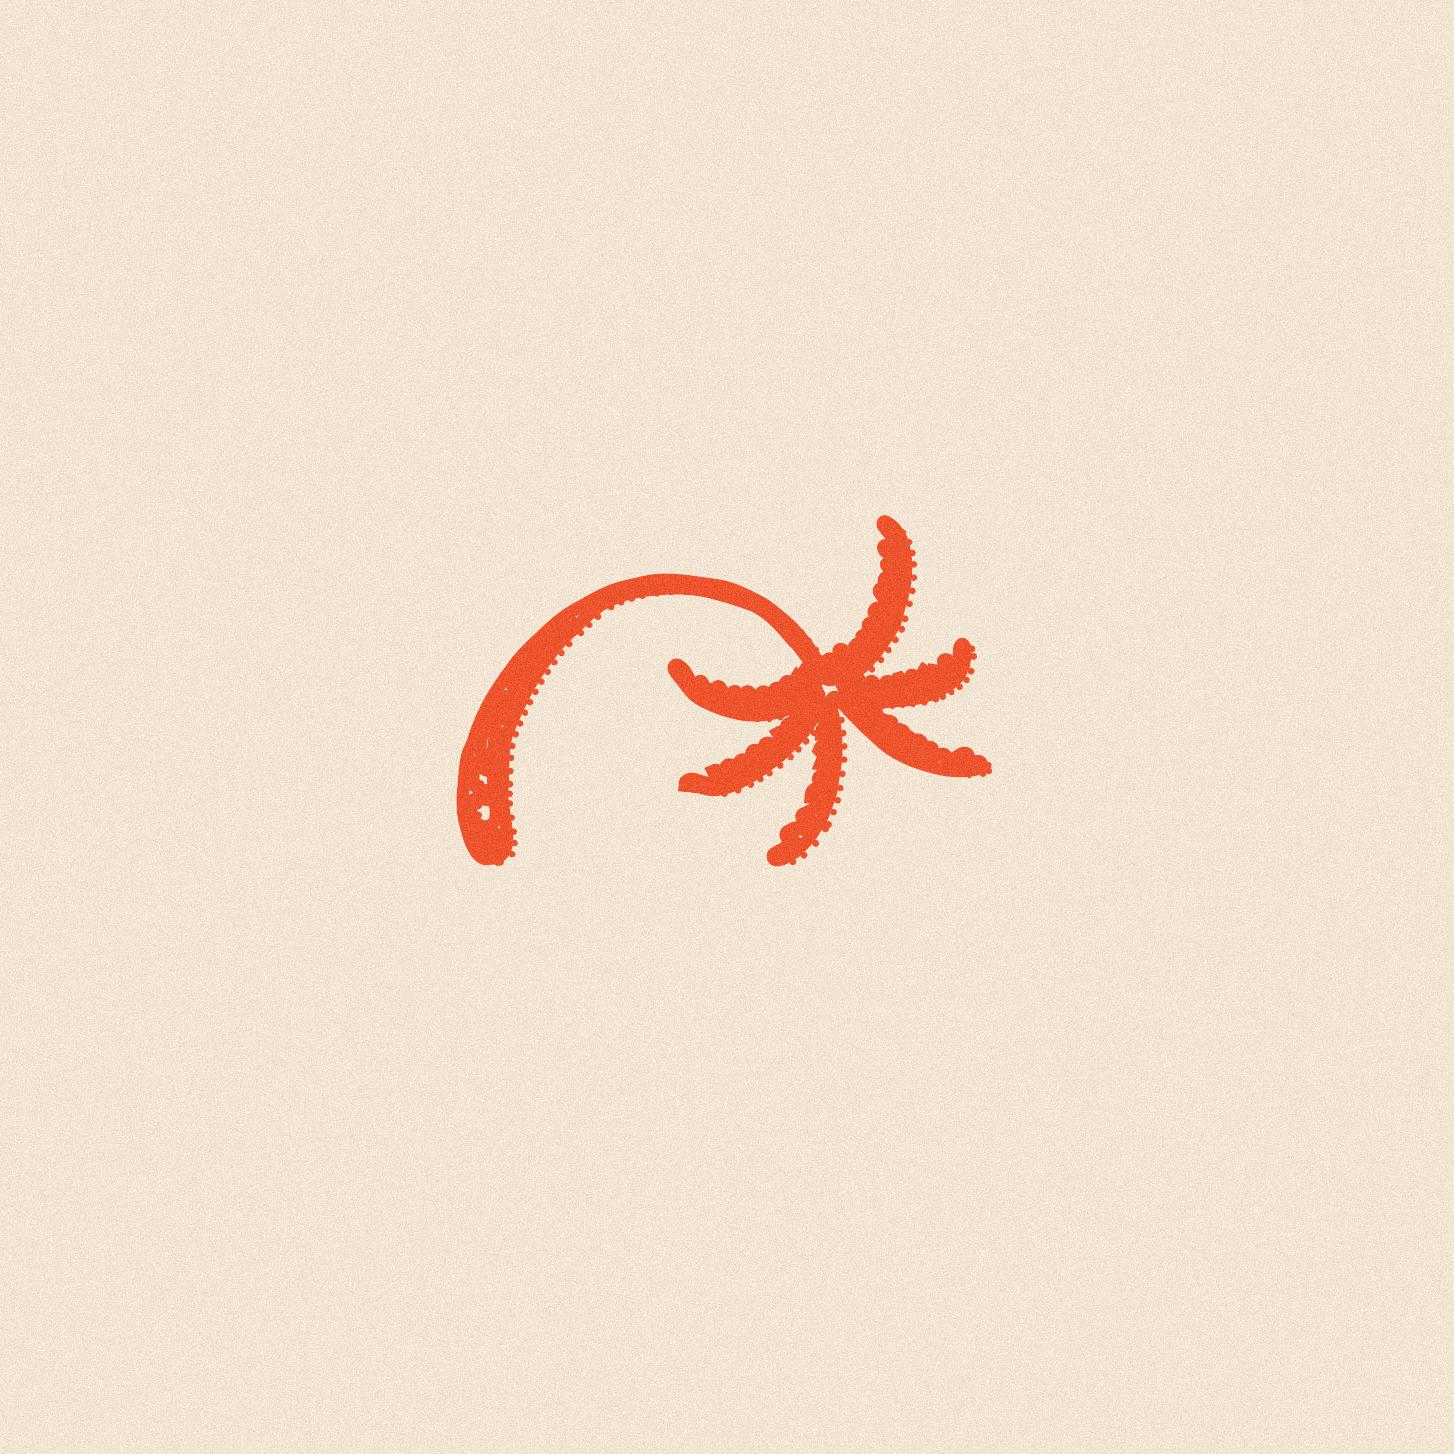 CIRCA-NOON_Current-Flavors-01_2.jpg